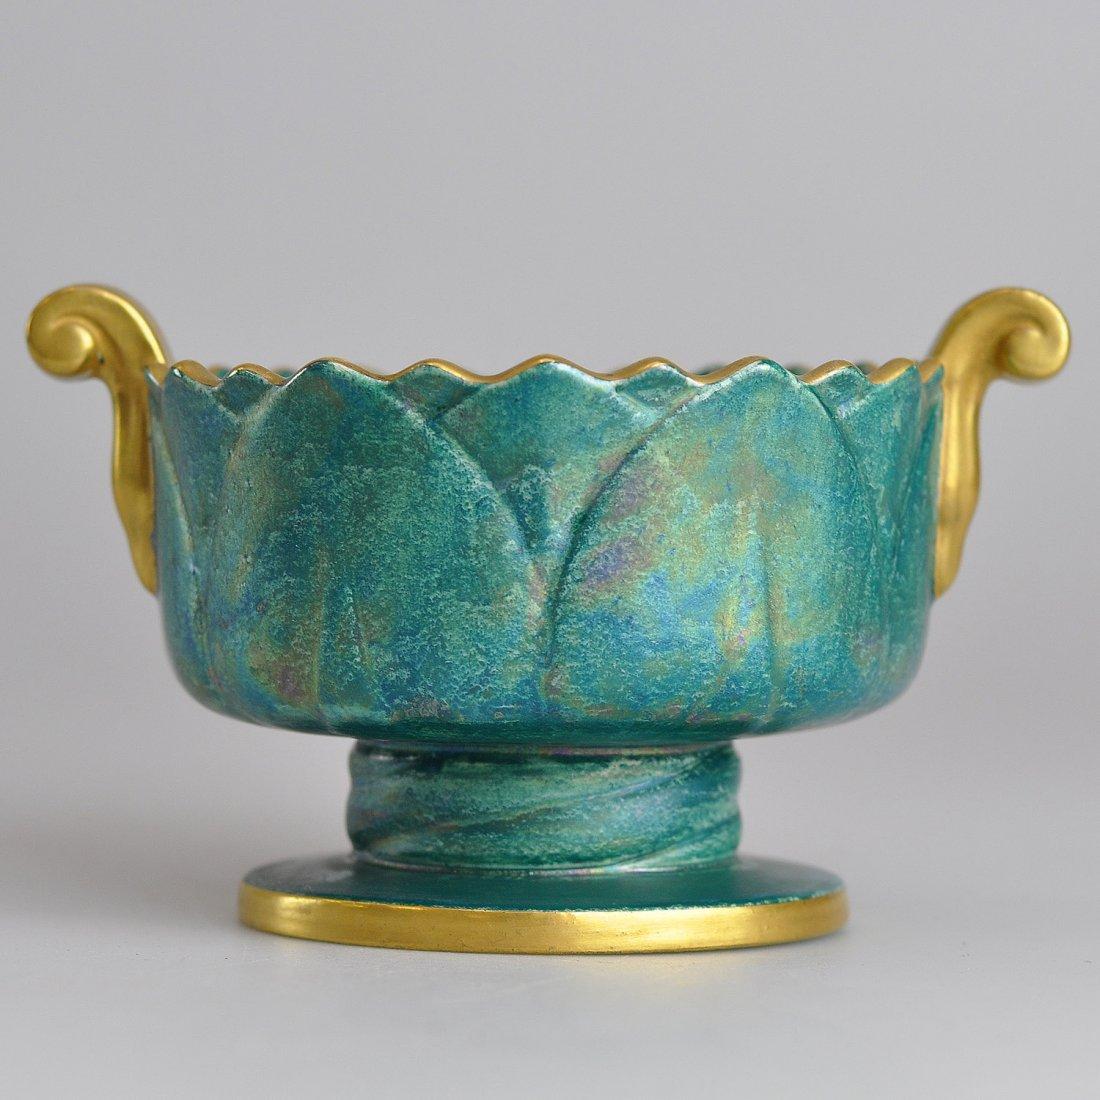 170: SKÅL, keramik, JOSEF EKBERG, Gustavsberg